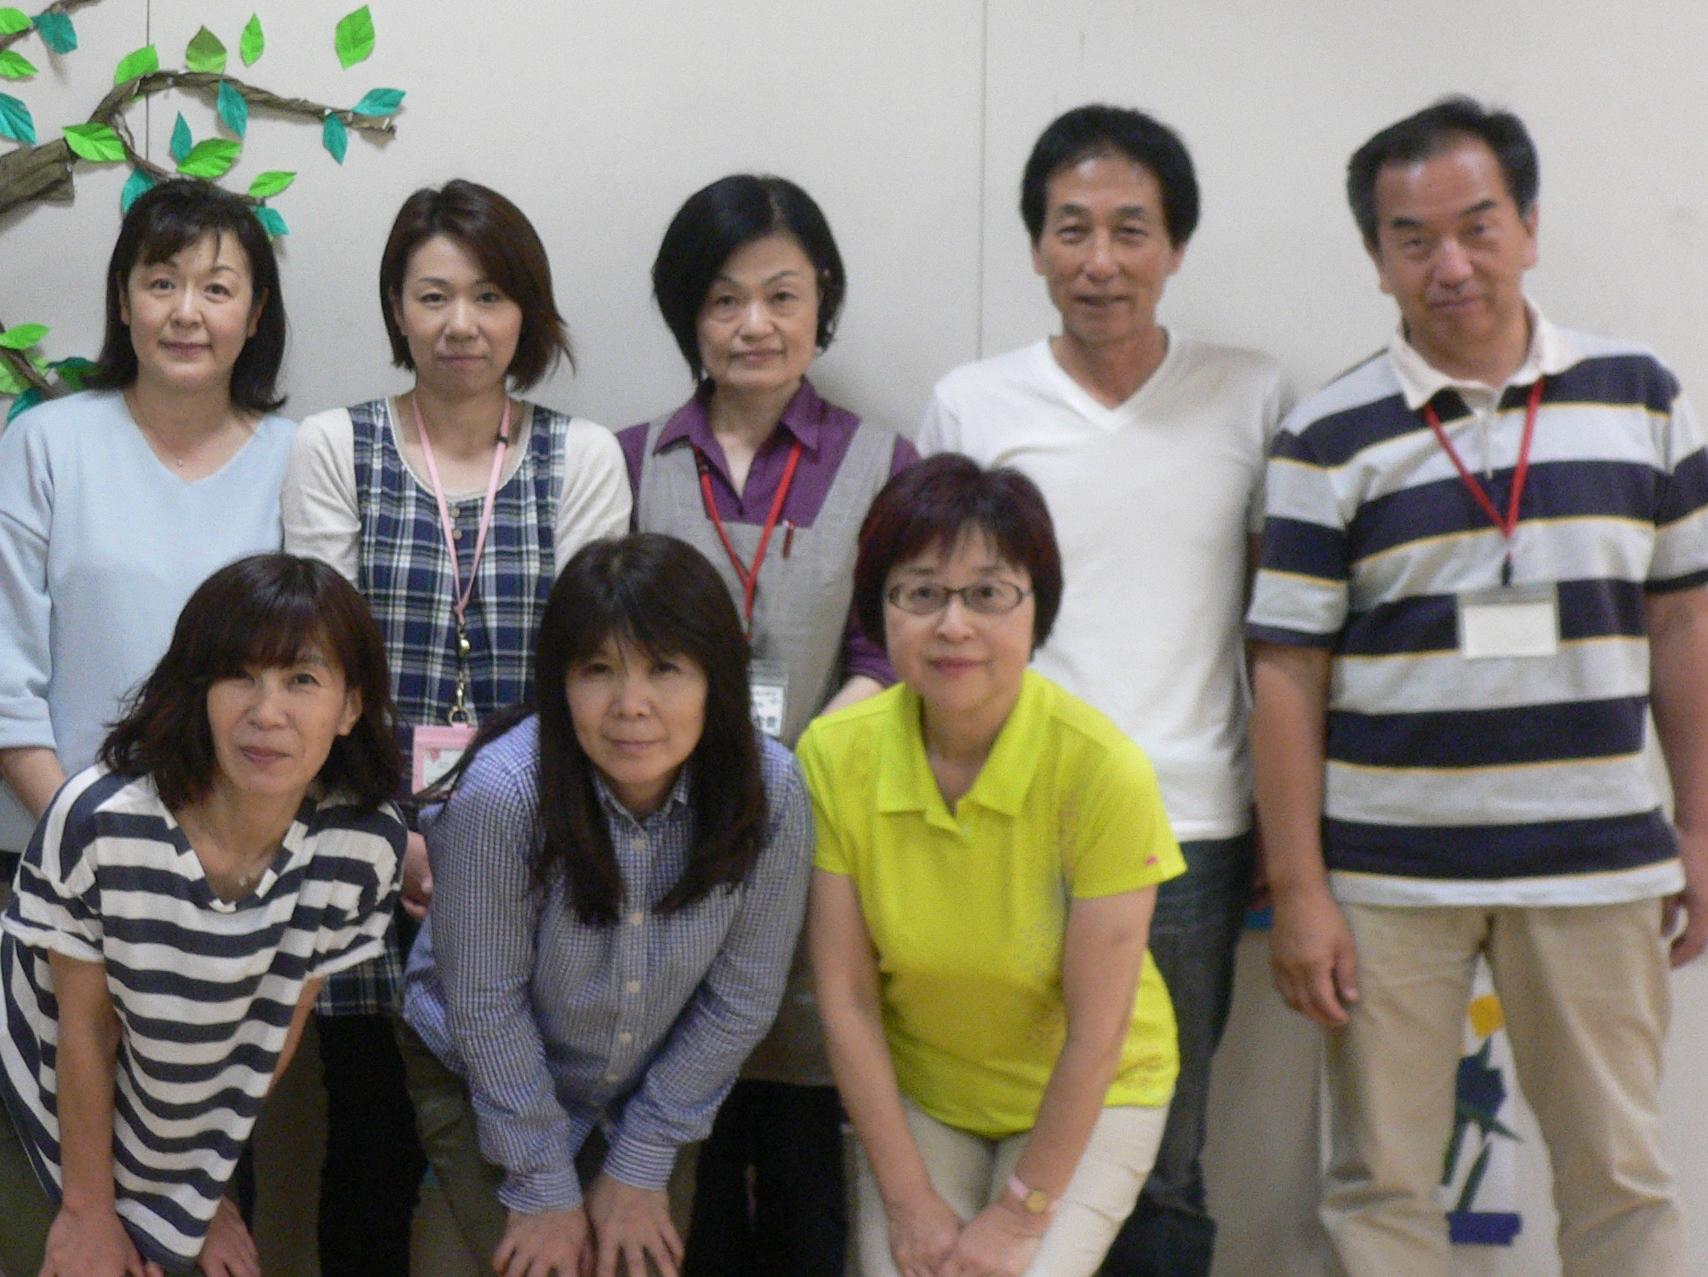 社会福祉法人 町田市福祉サービス協会